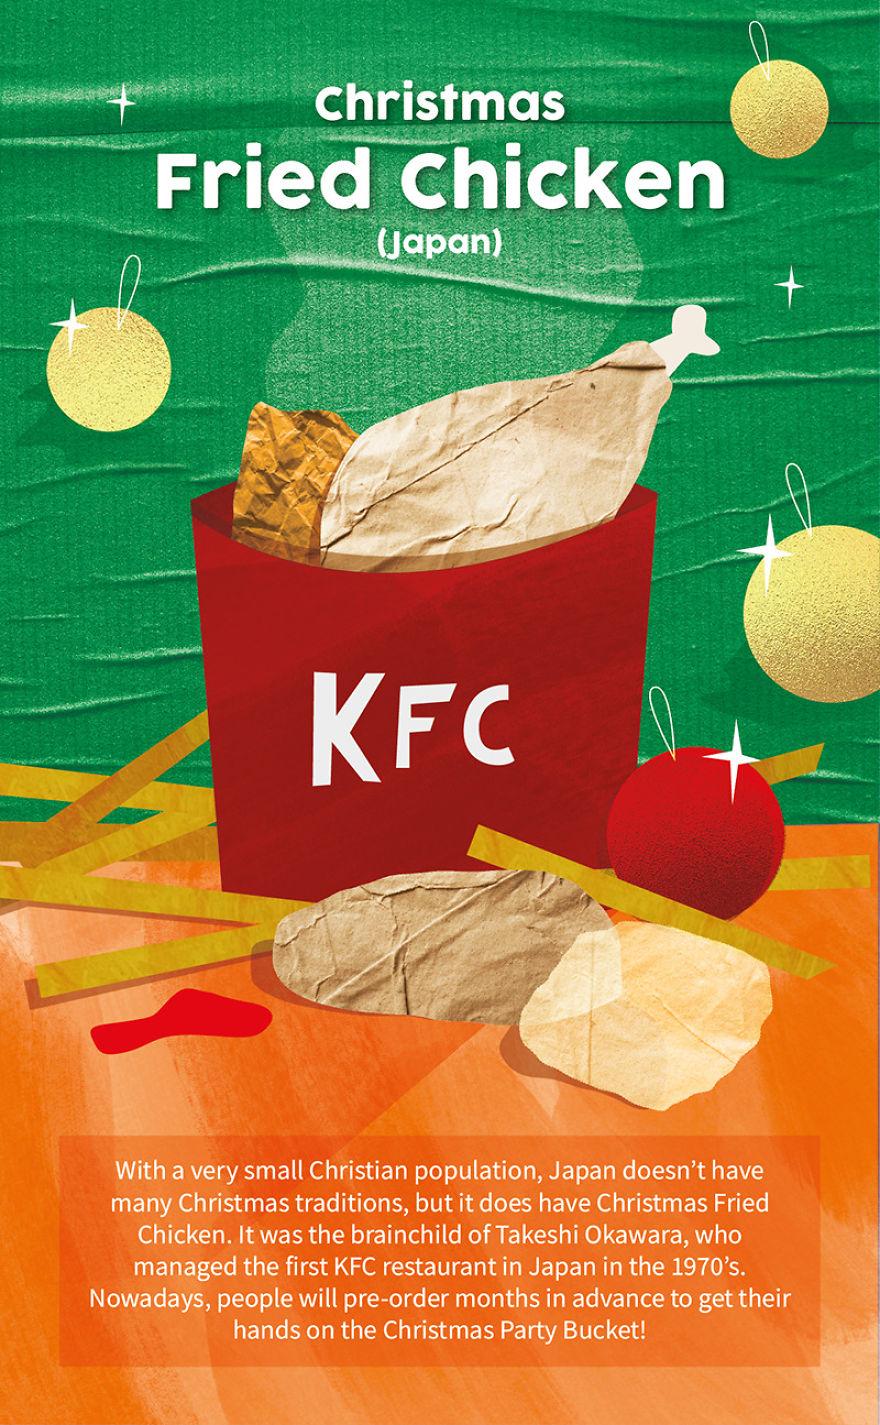 Kfc Christmas Dinner - Japan